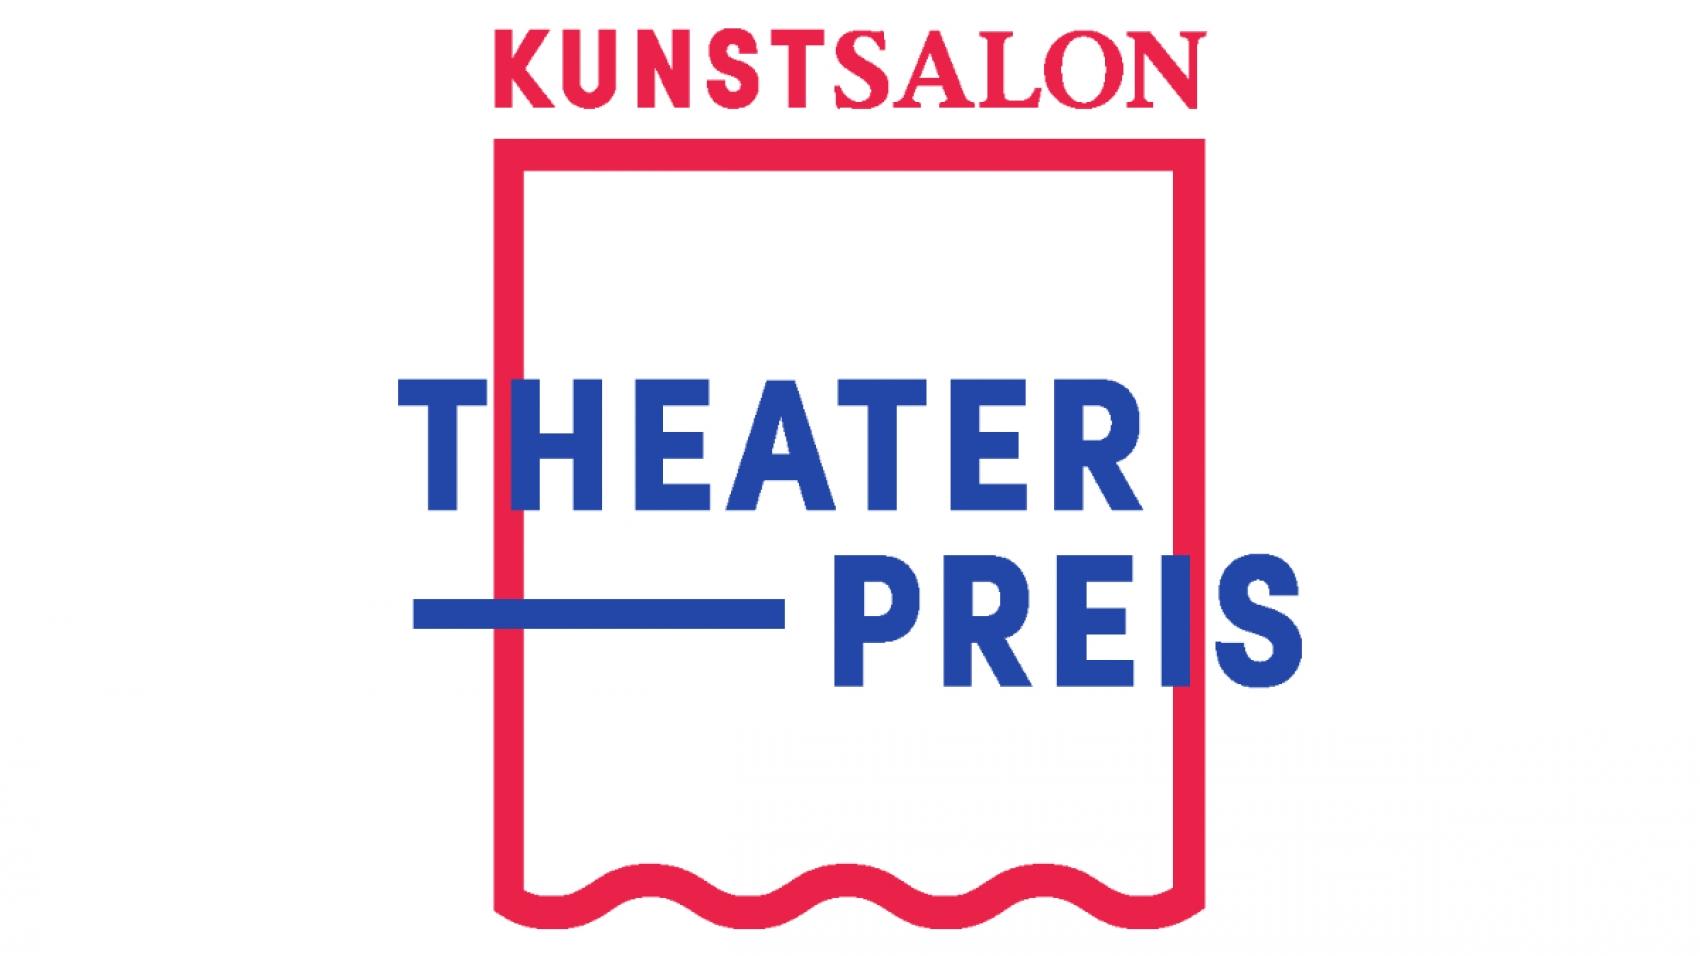 KunstSalon